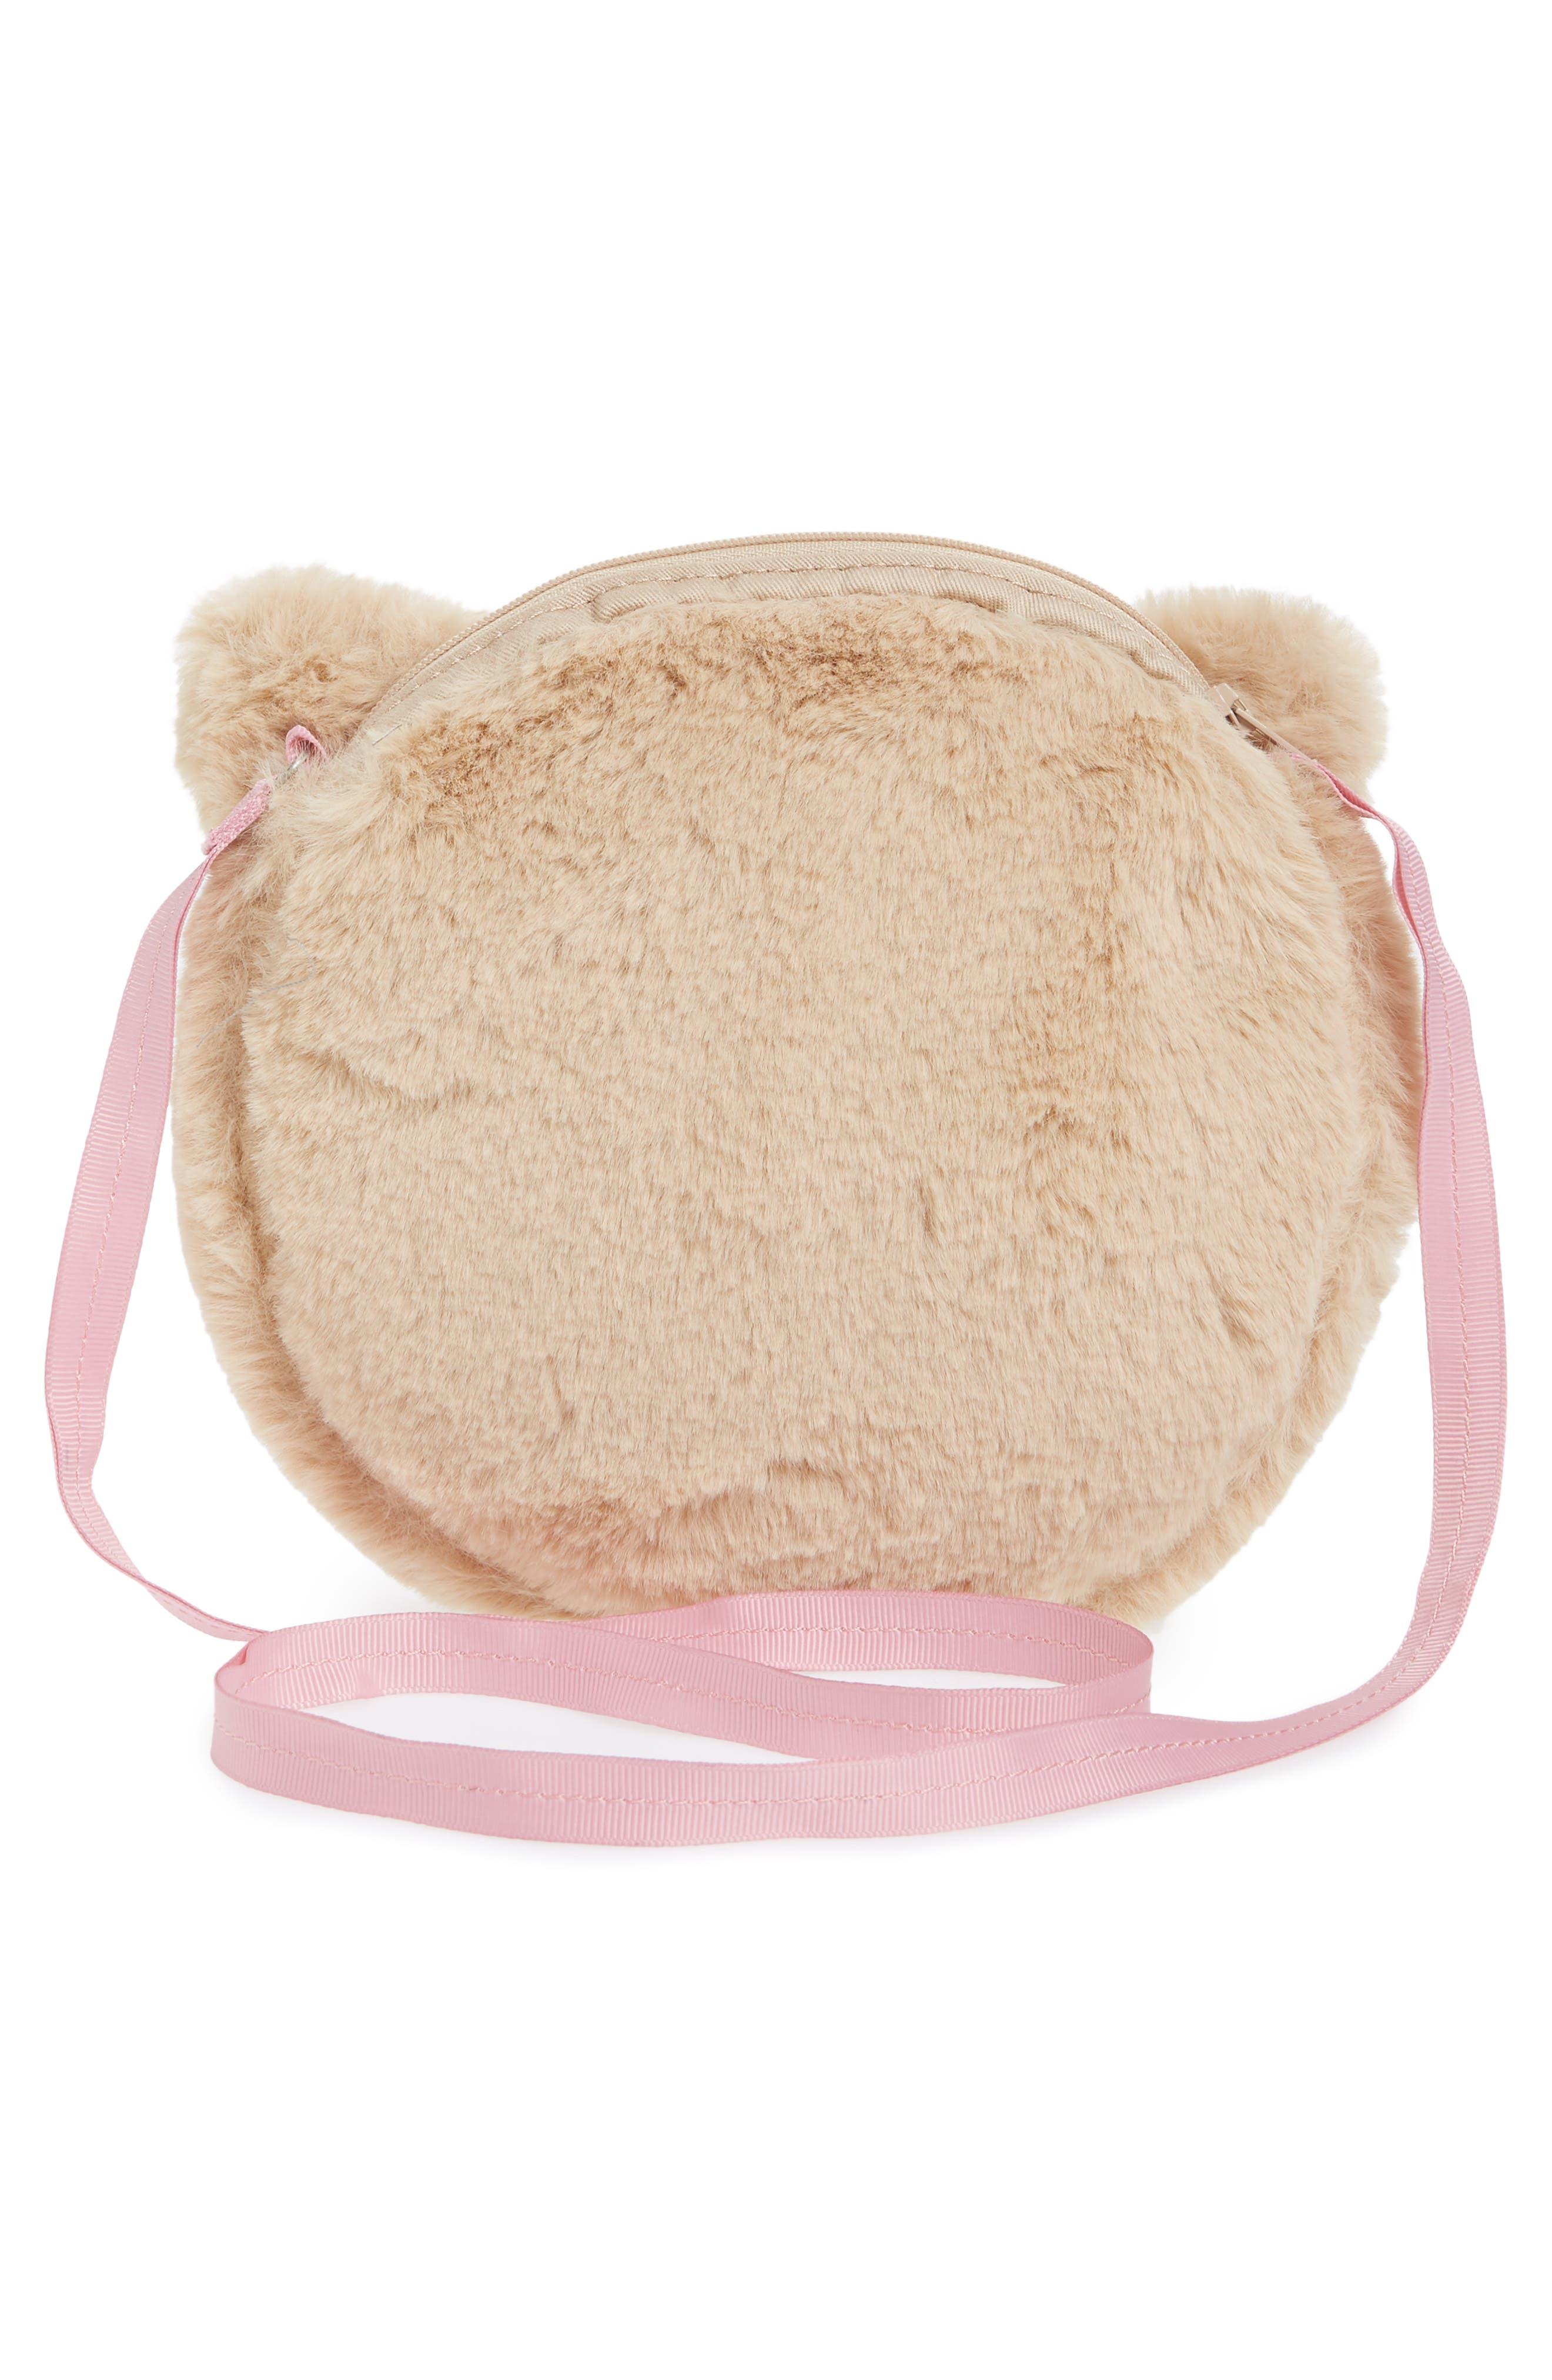 Kitty Faux Fur Crossbody Bag,                             Alternate thumbnail 2, color,                             Oat